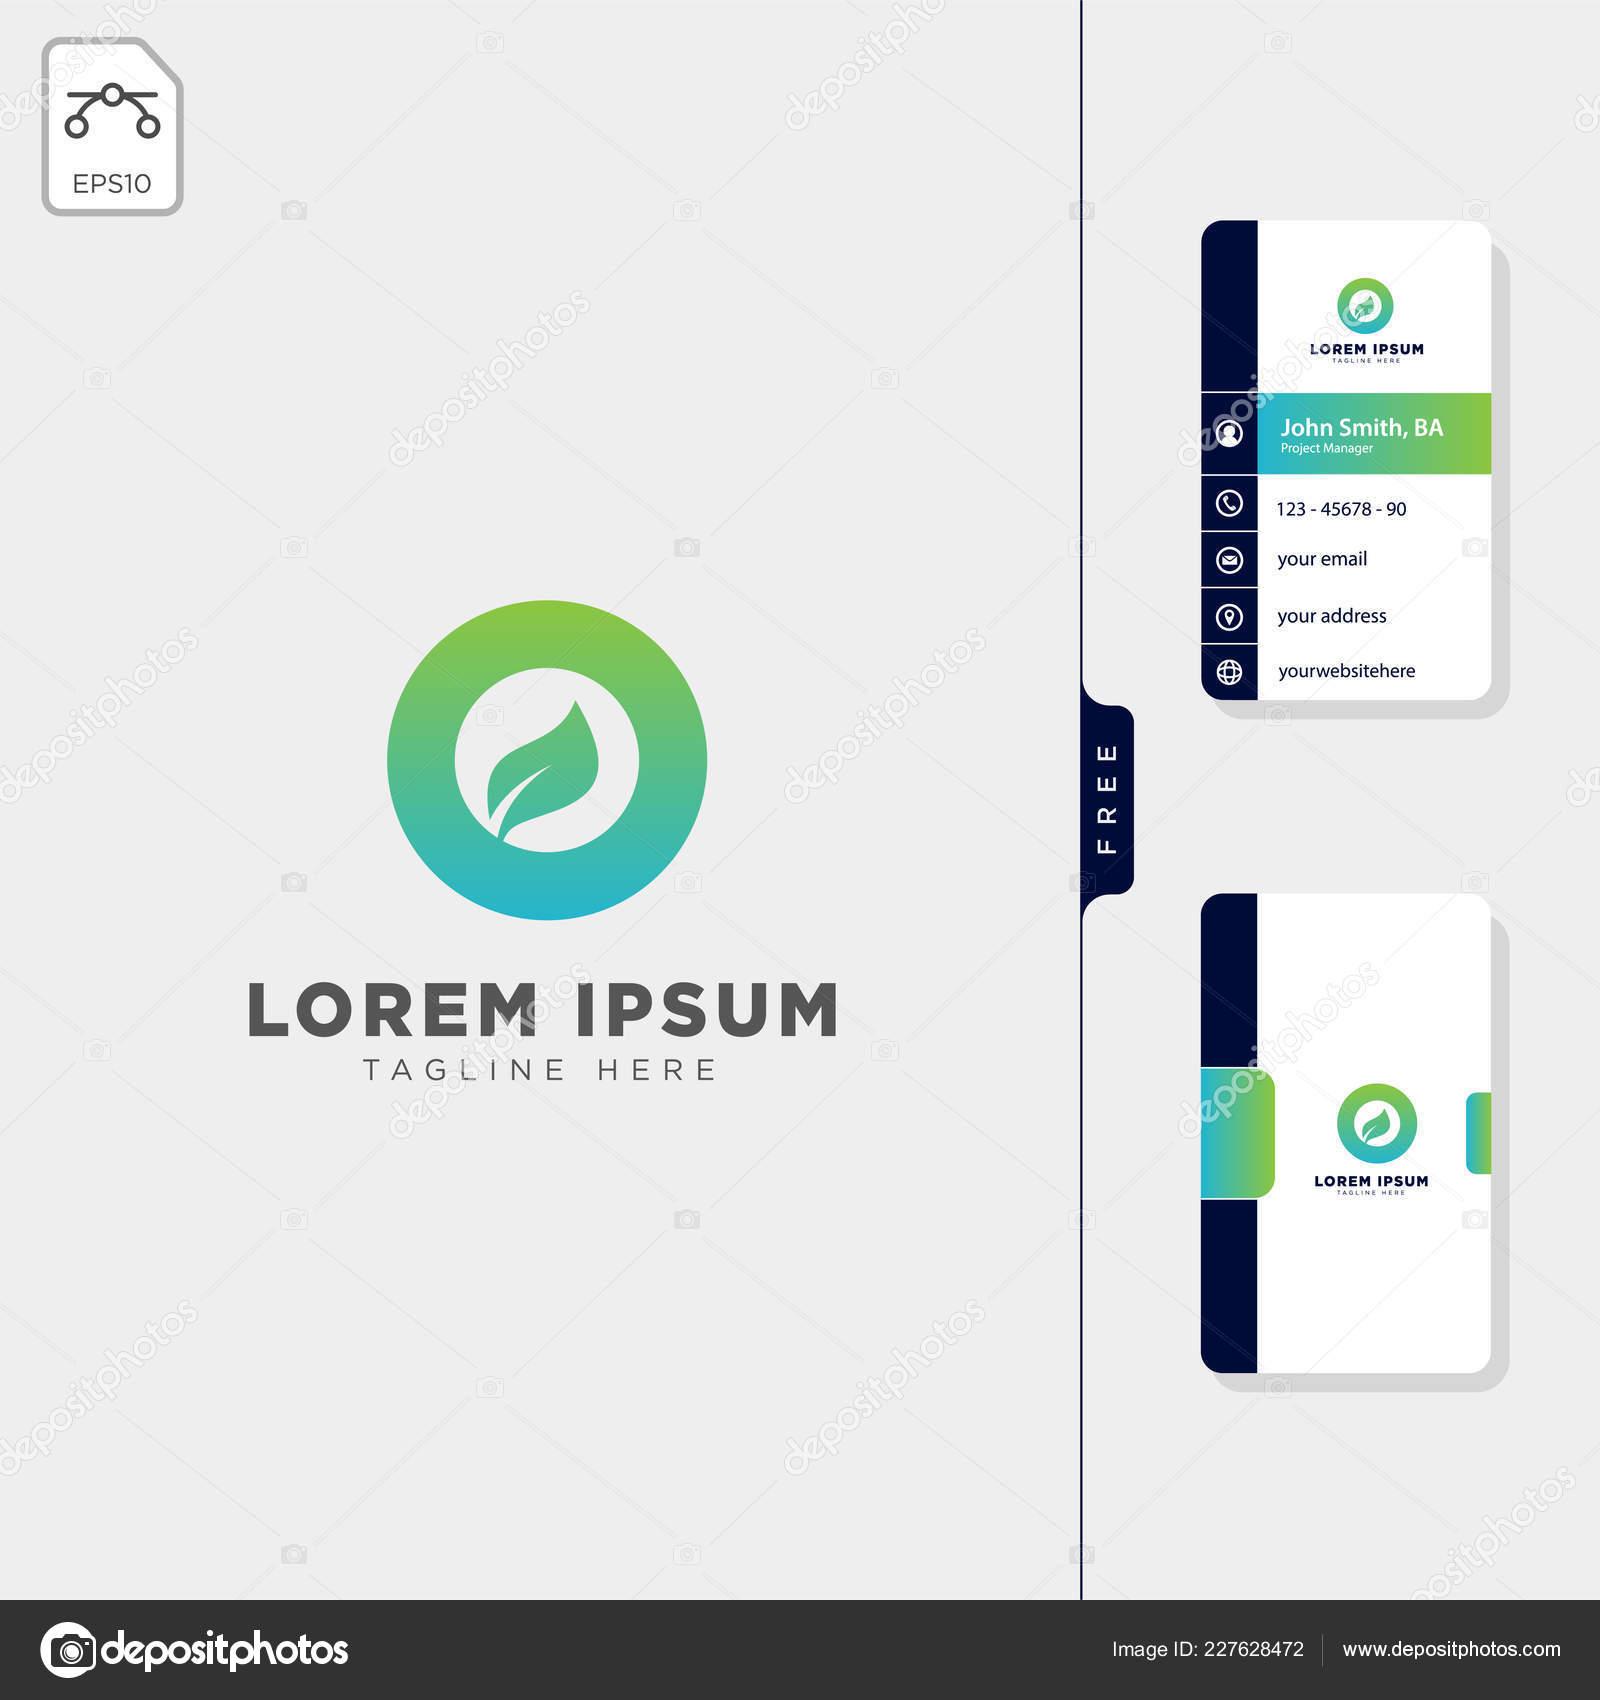 Minimum Feuille Logo Initial Vector Illustration Gratuit Carte Visite Design Image Vectorielle